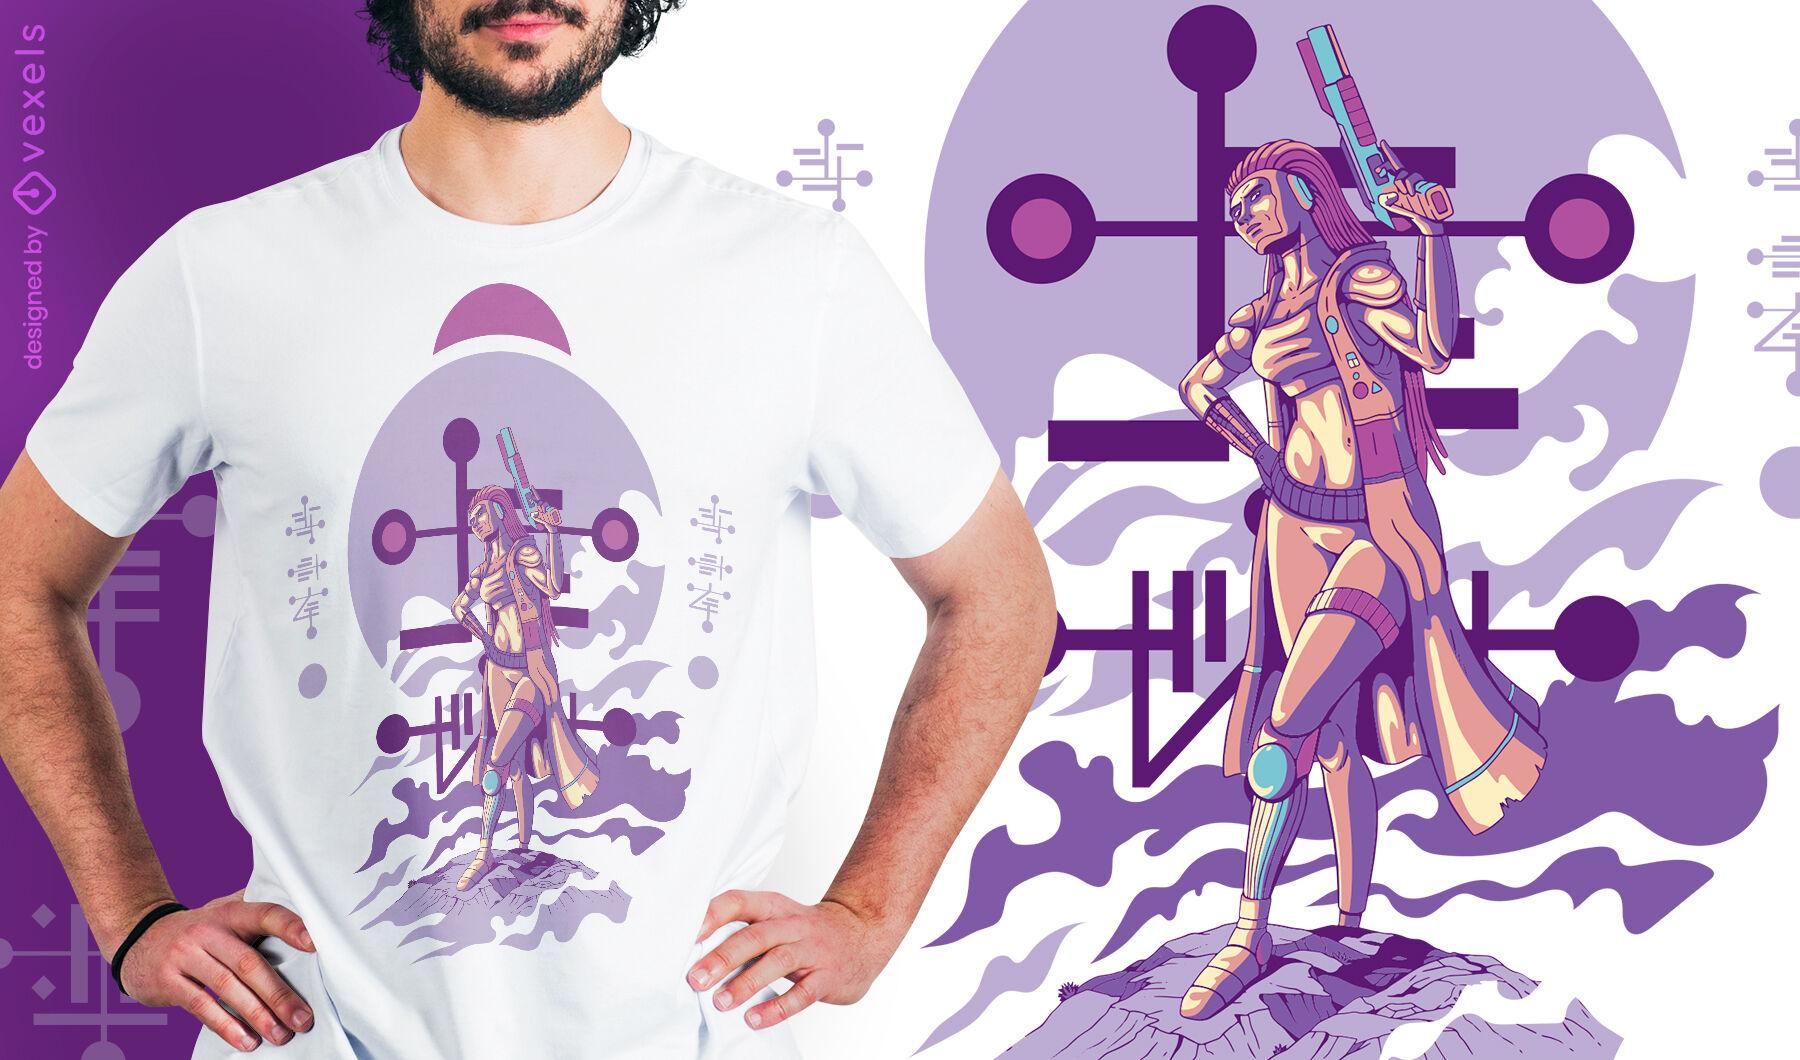 Female humanoid alien with gun t-shirt design